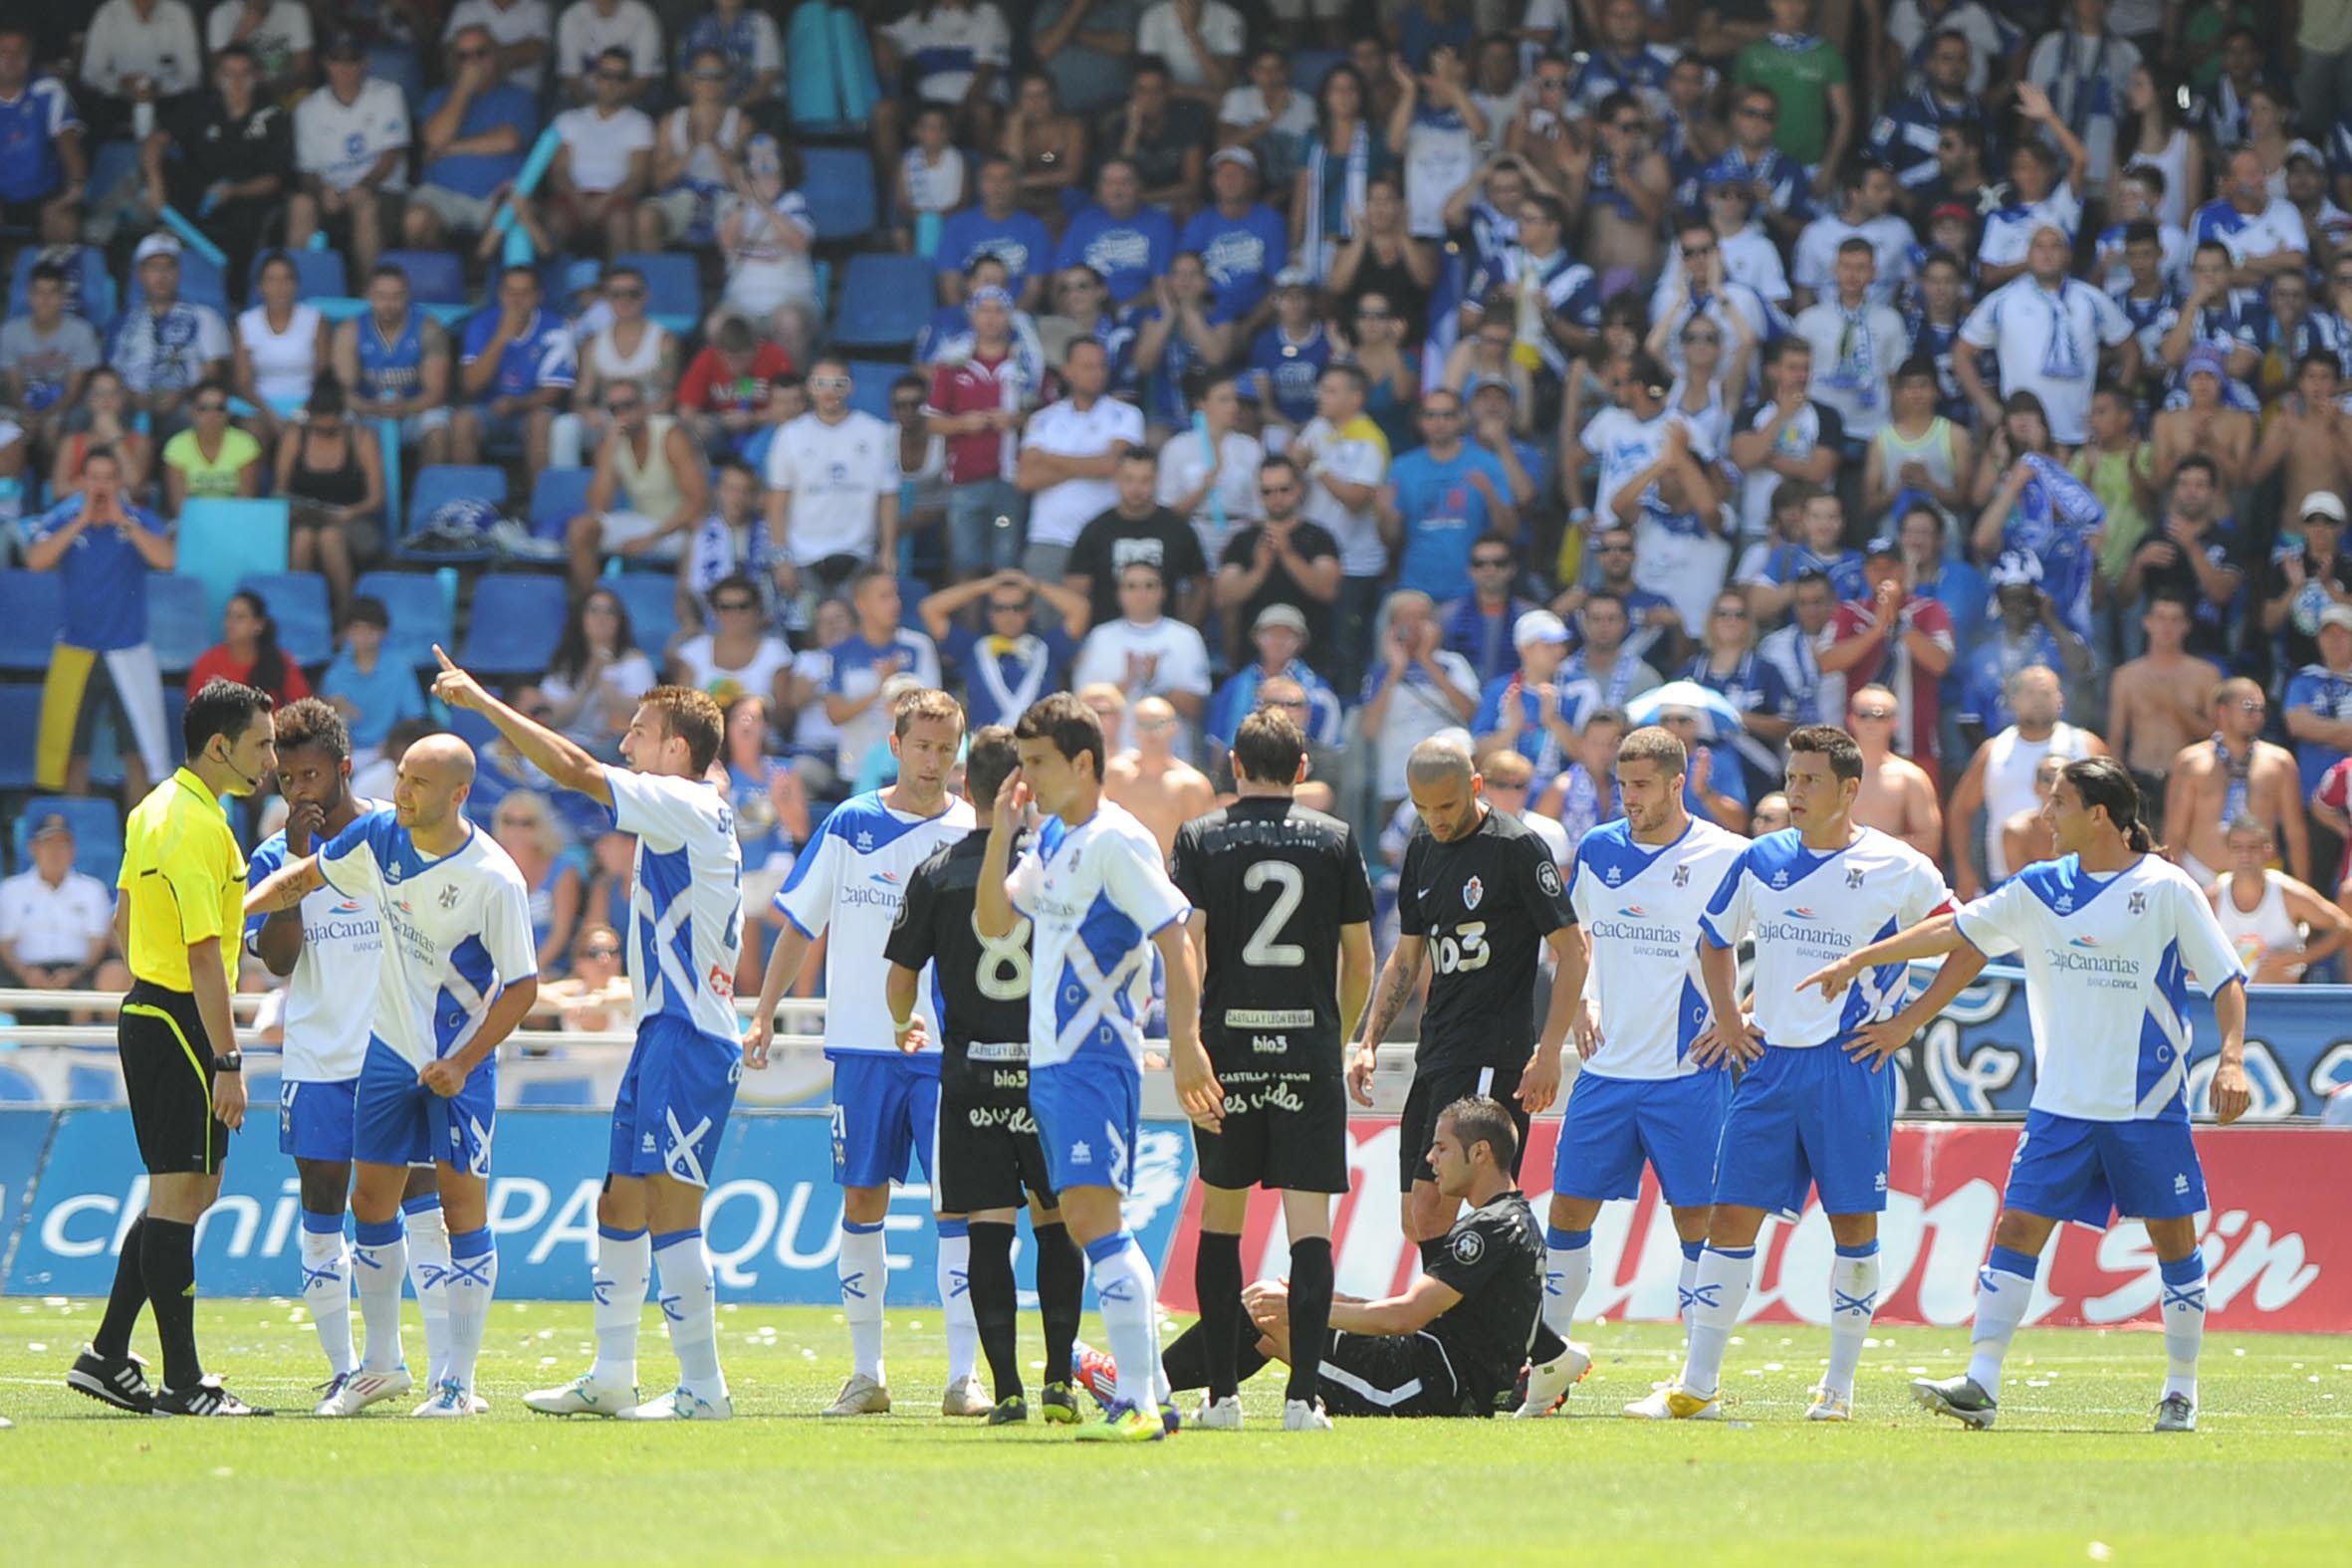 El duelo de vuelta de la eliminatoria de ascenso llenó de tristeza las gradas del Rodríguez López. / S. MÉNDEZ